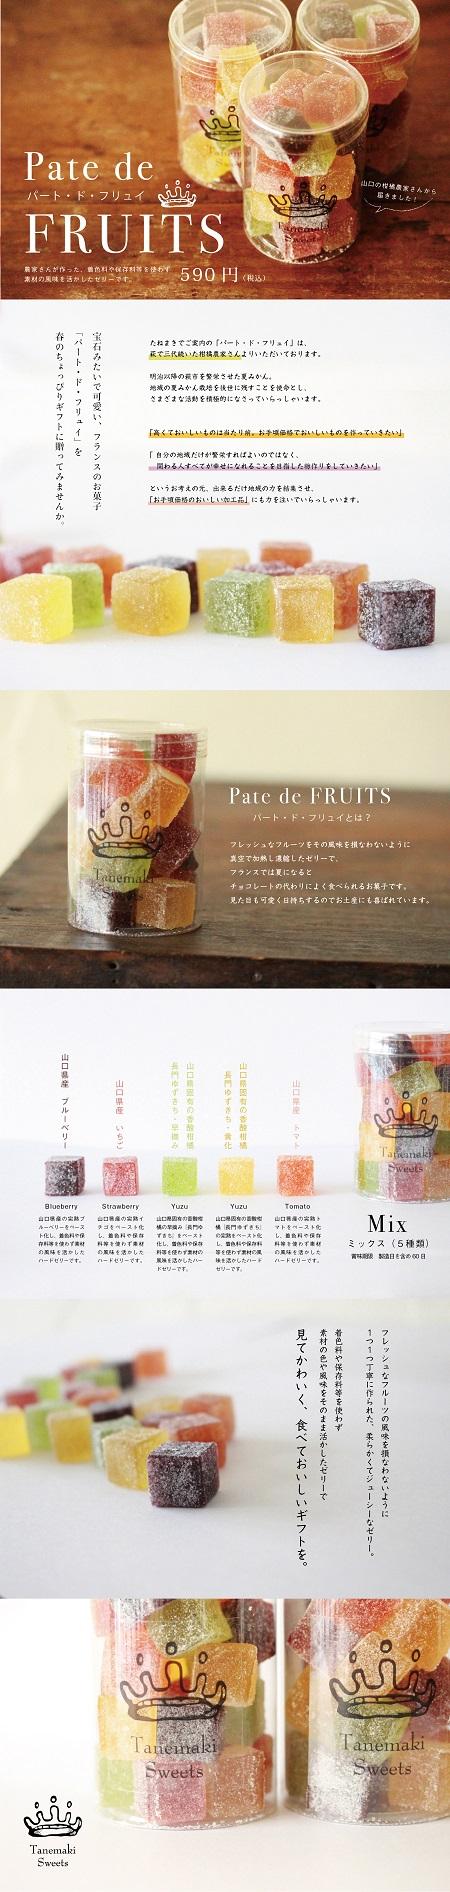 Pate_de_Fruits_21.jpg